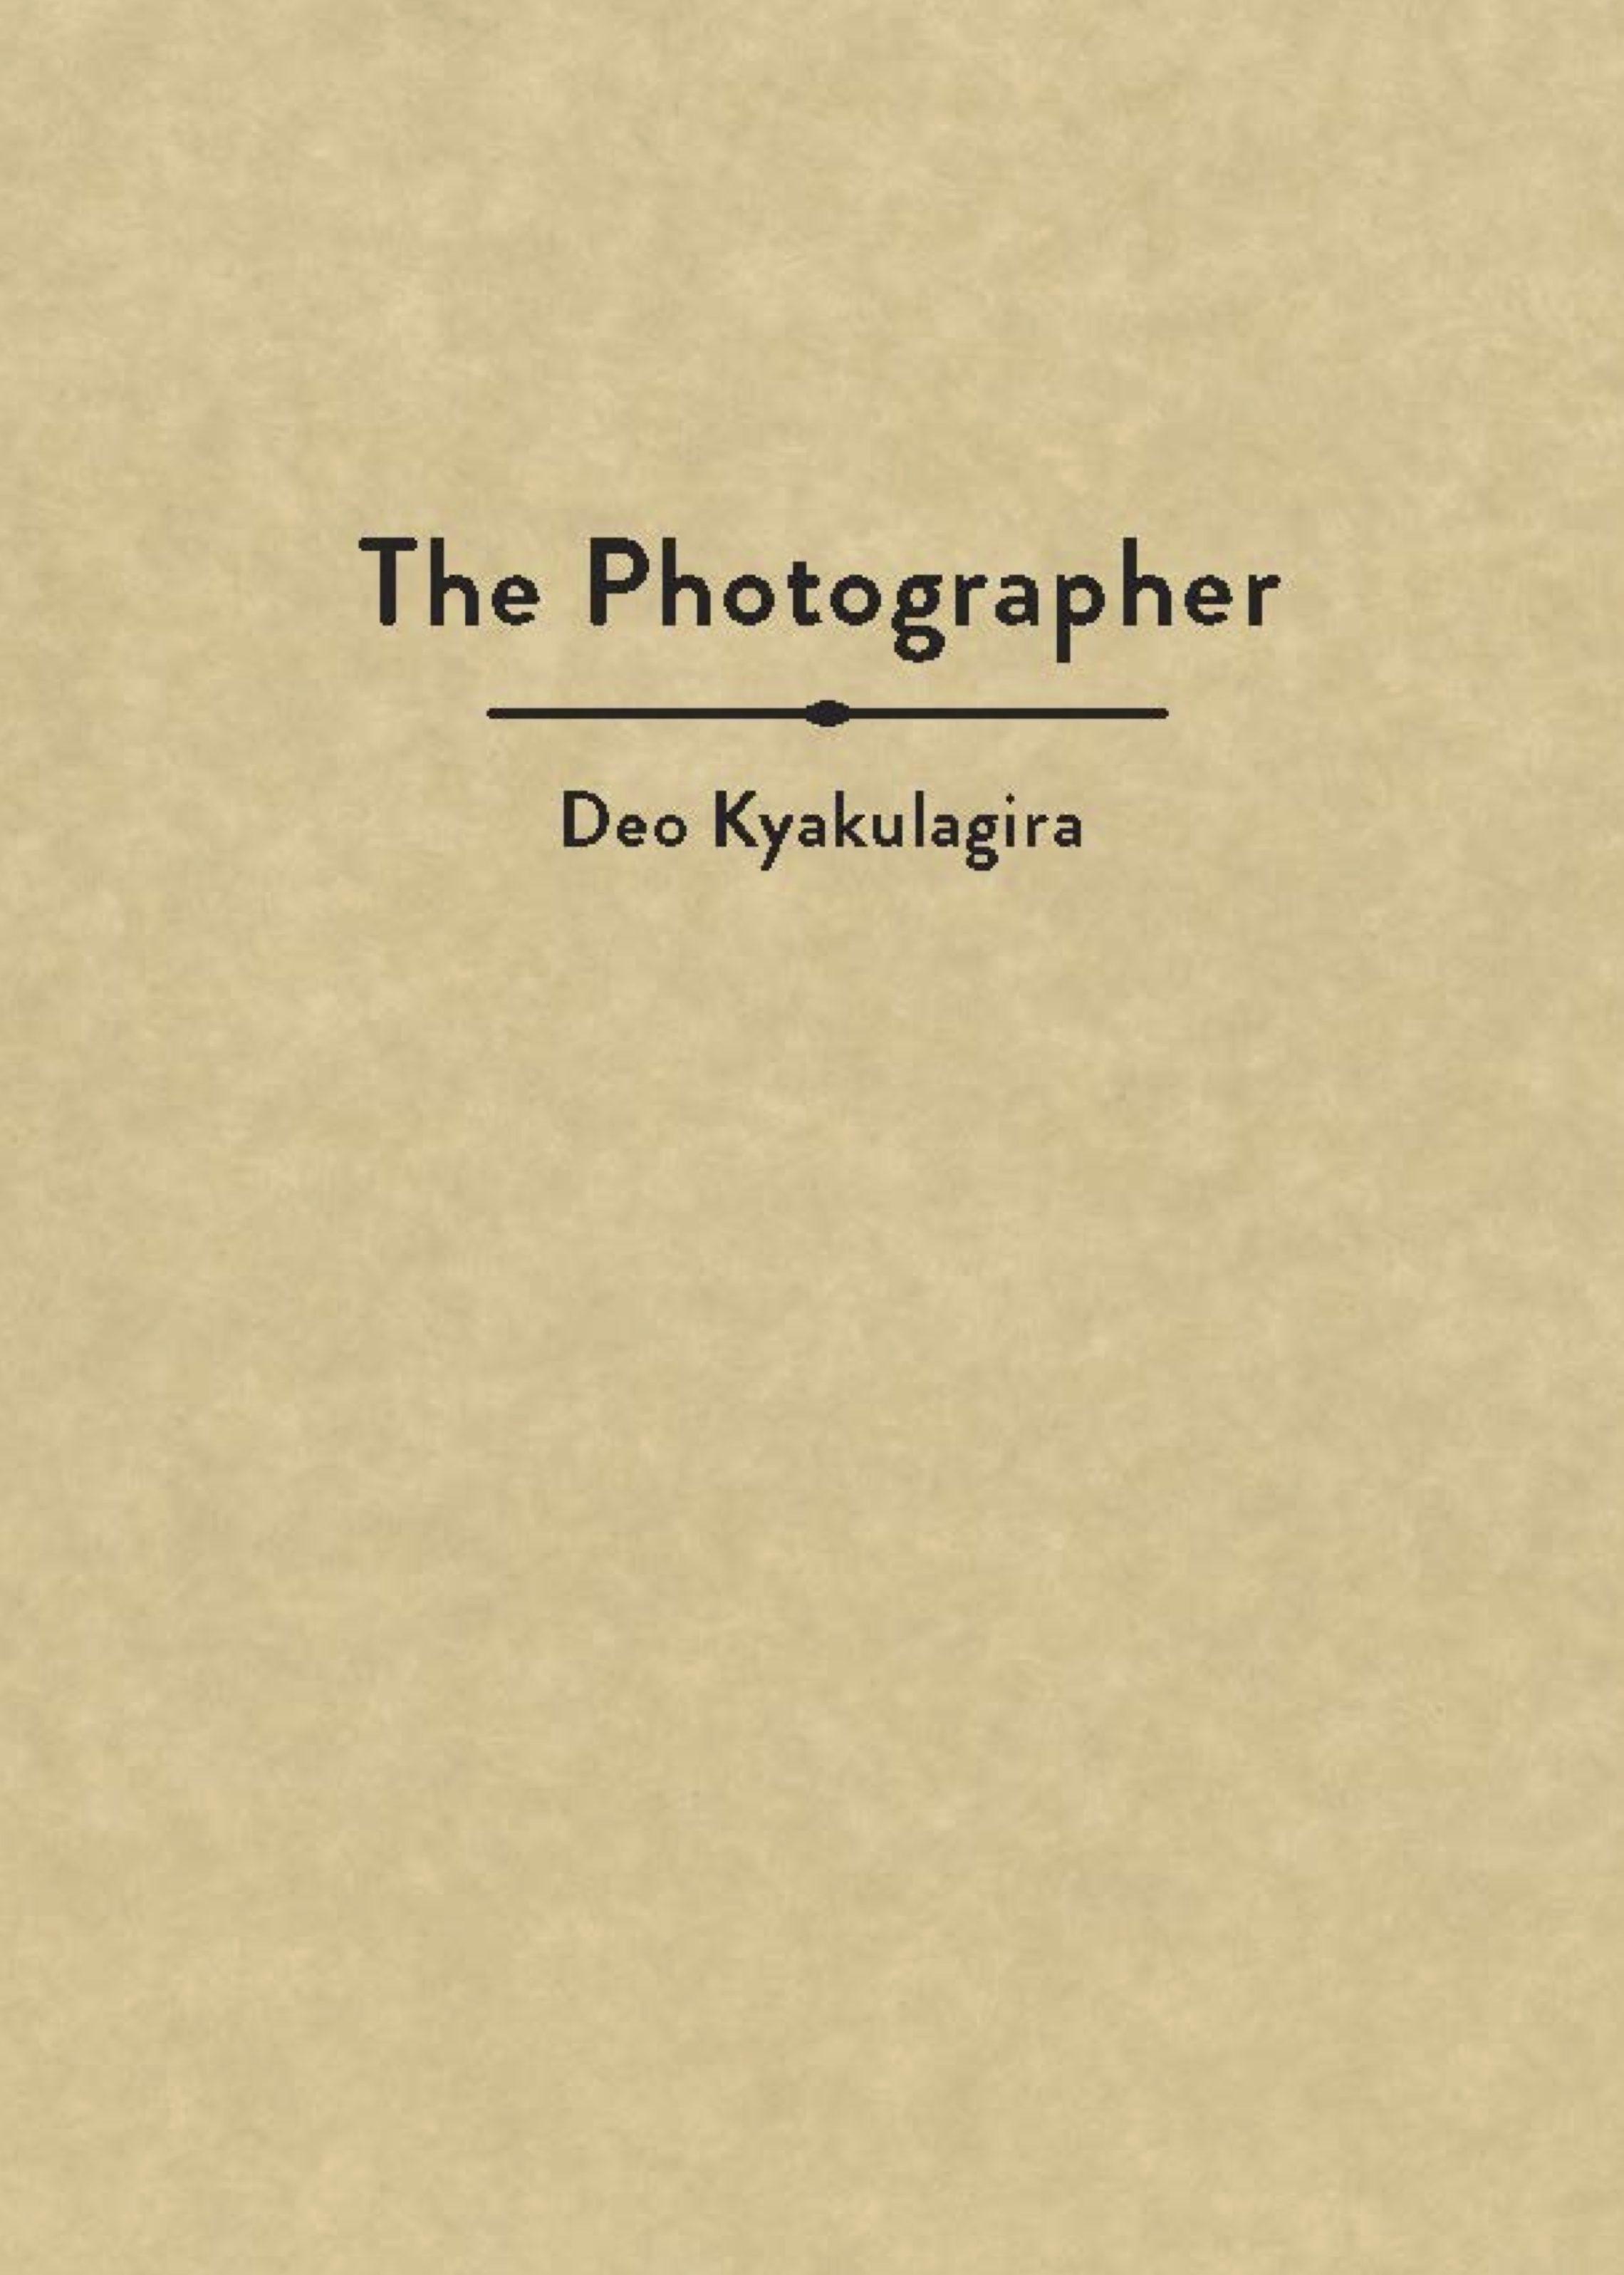 EBI- The Photographer Cover